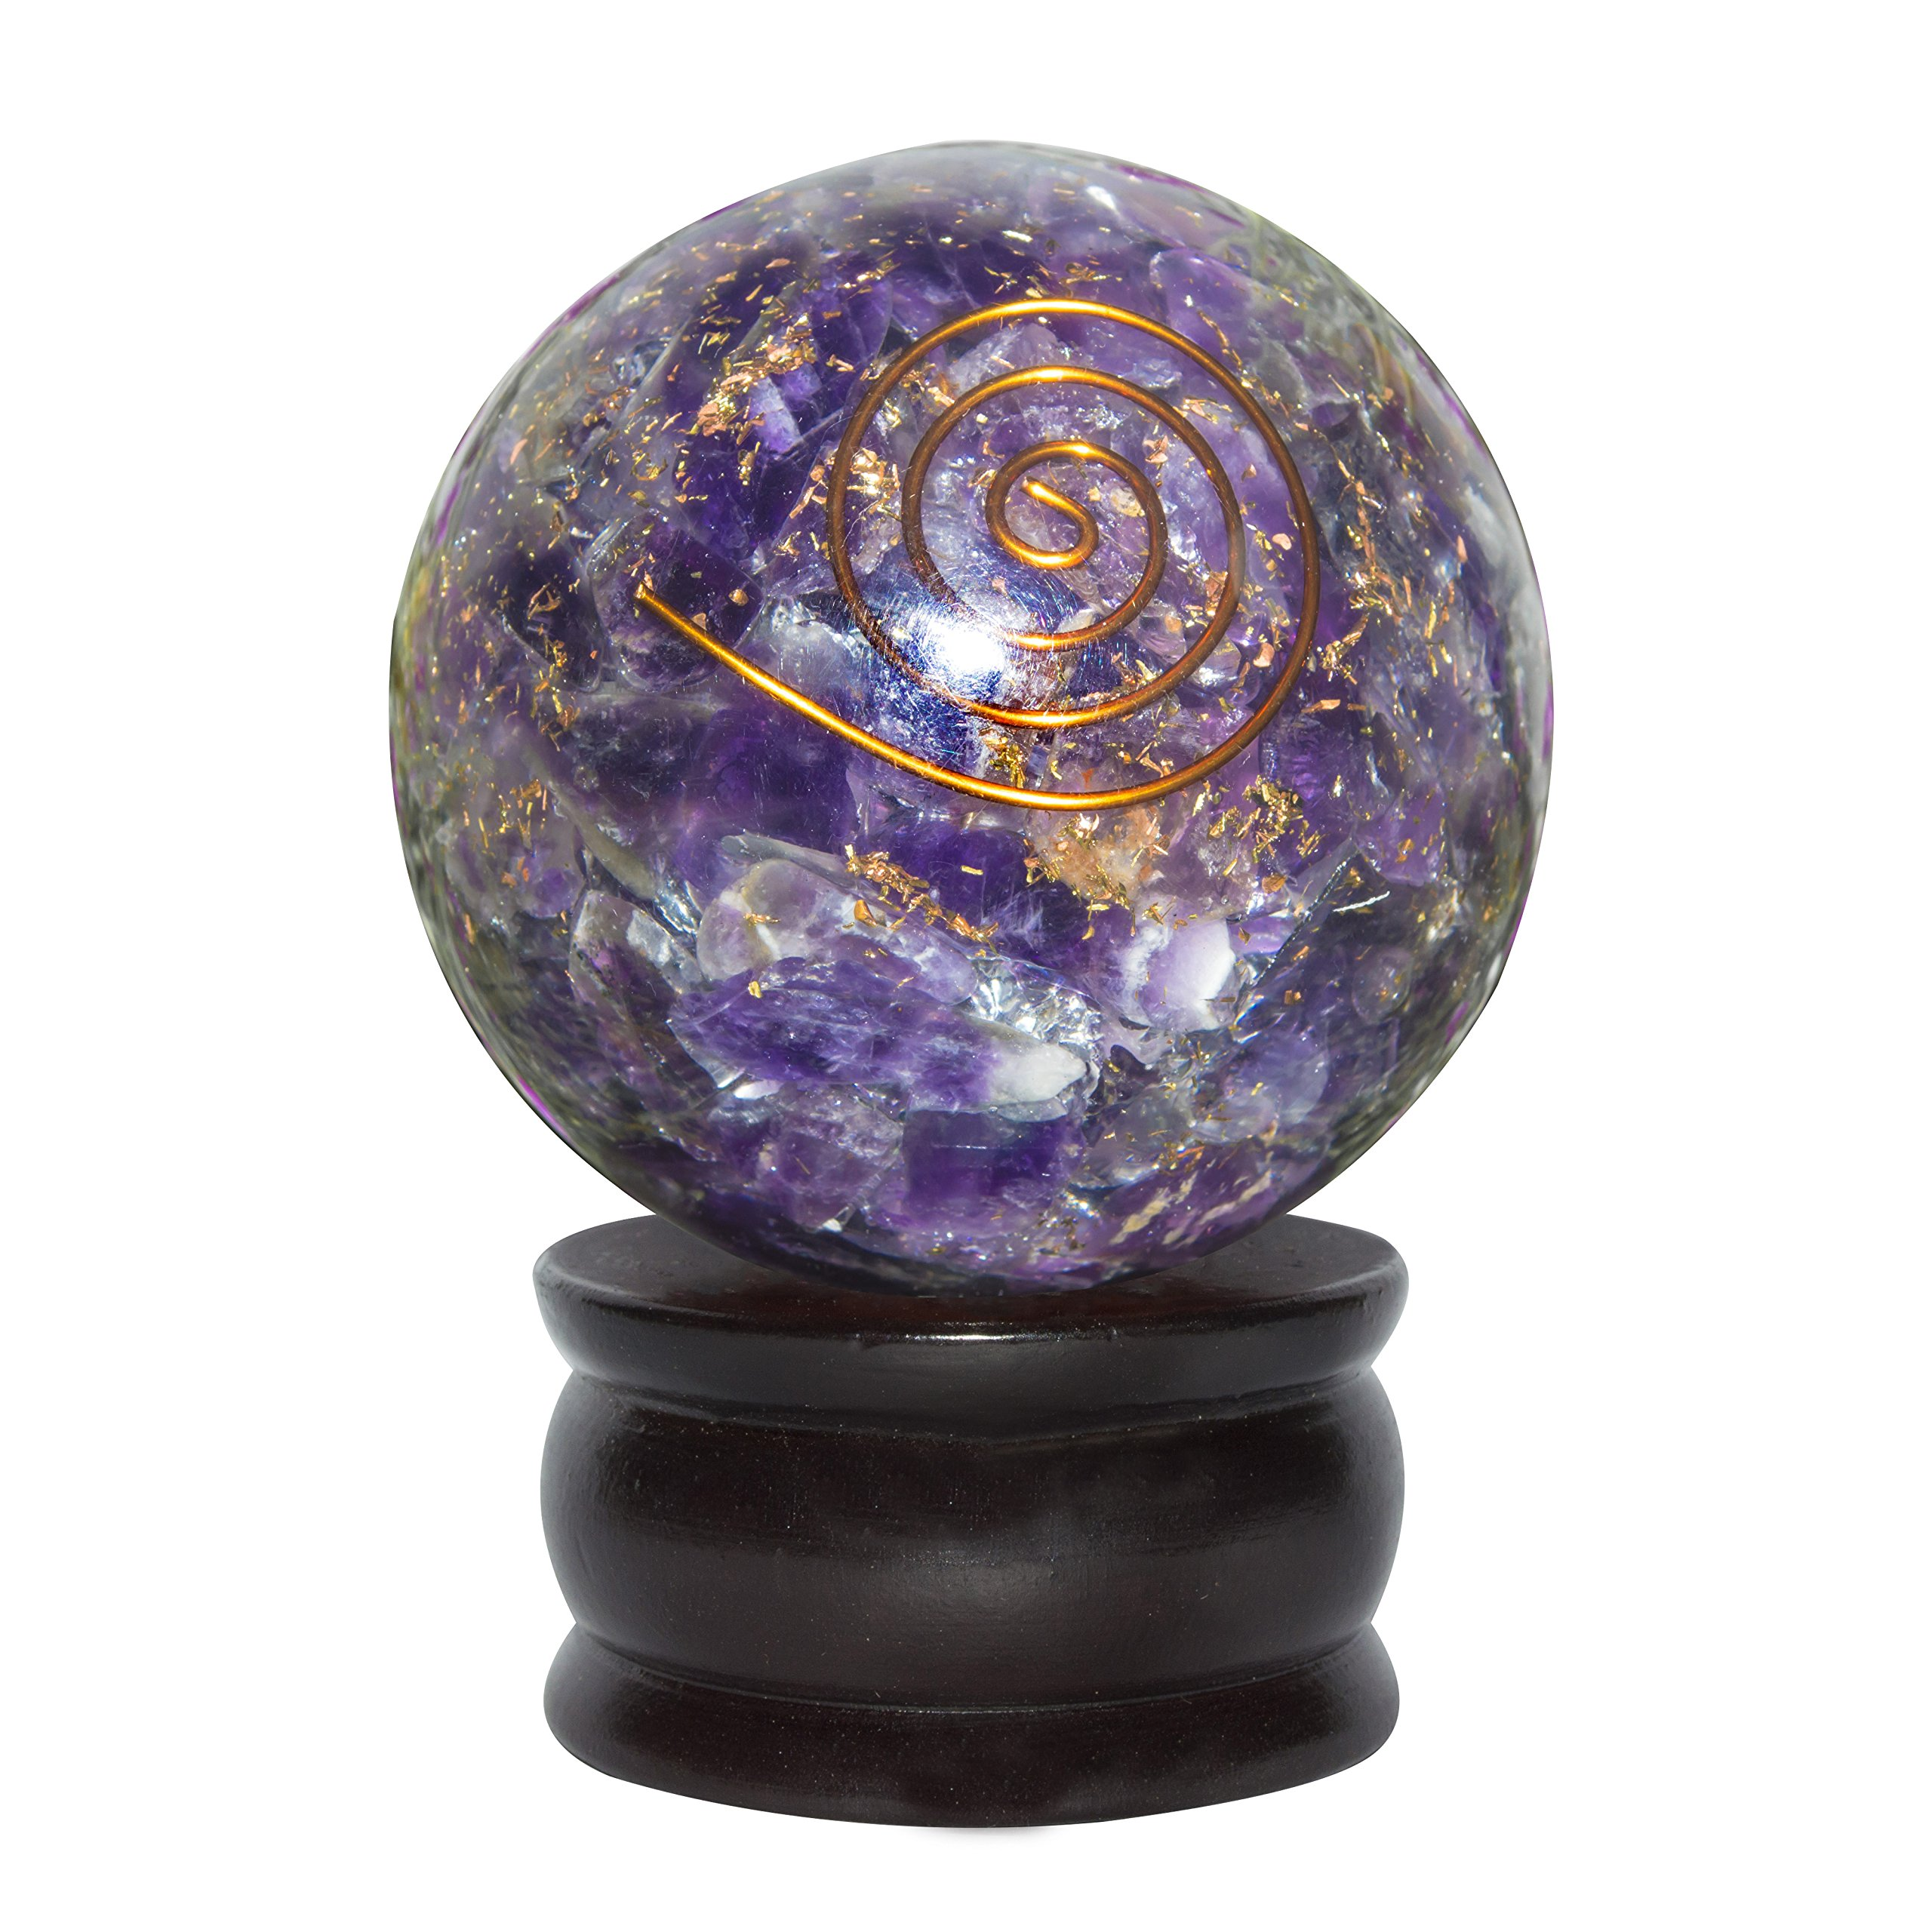 Crocon Amethyst Reiki Healing Orgone Crystal Sphere Ball Gemstone Energy Generator For Aura Cleansing Chakra Balancing & EMF Protection 50-55mm